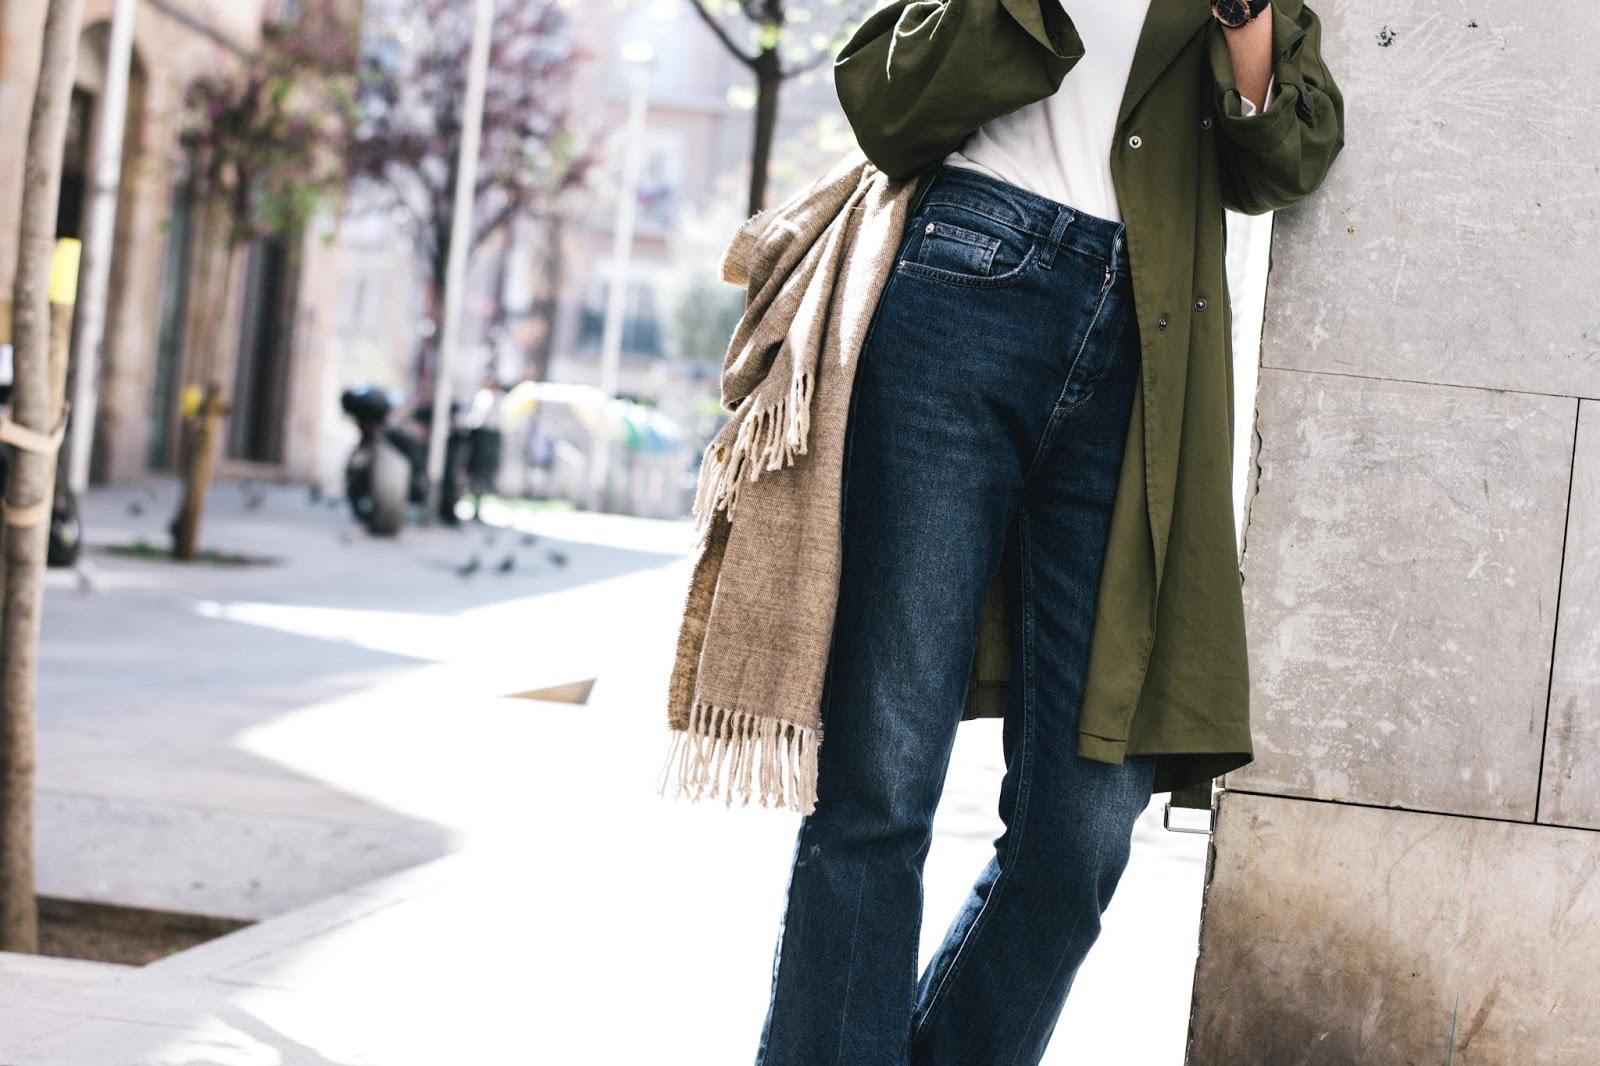 Jeans urban Outfiters, camiseta Mango, gabardina Topshop, sandalias Menbur